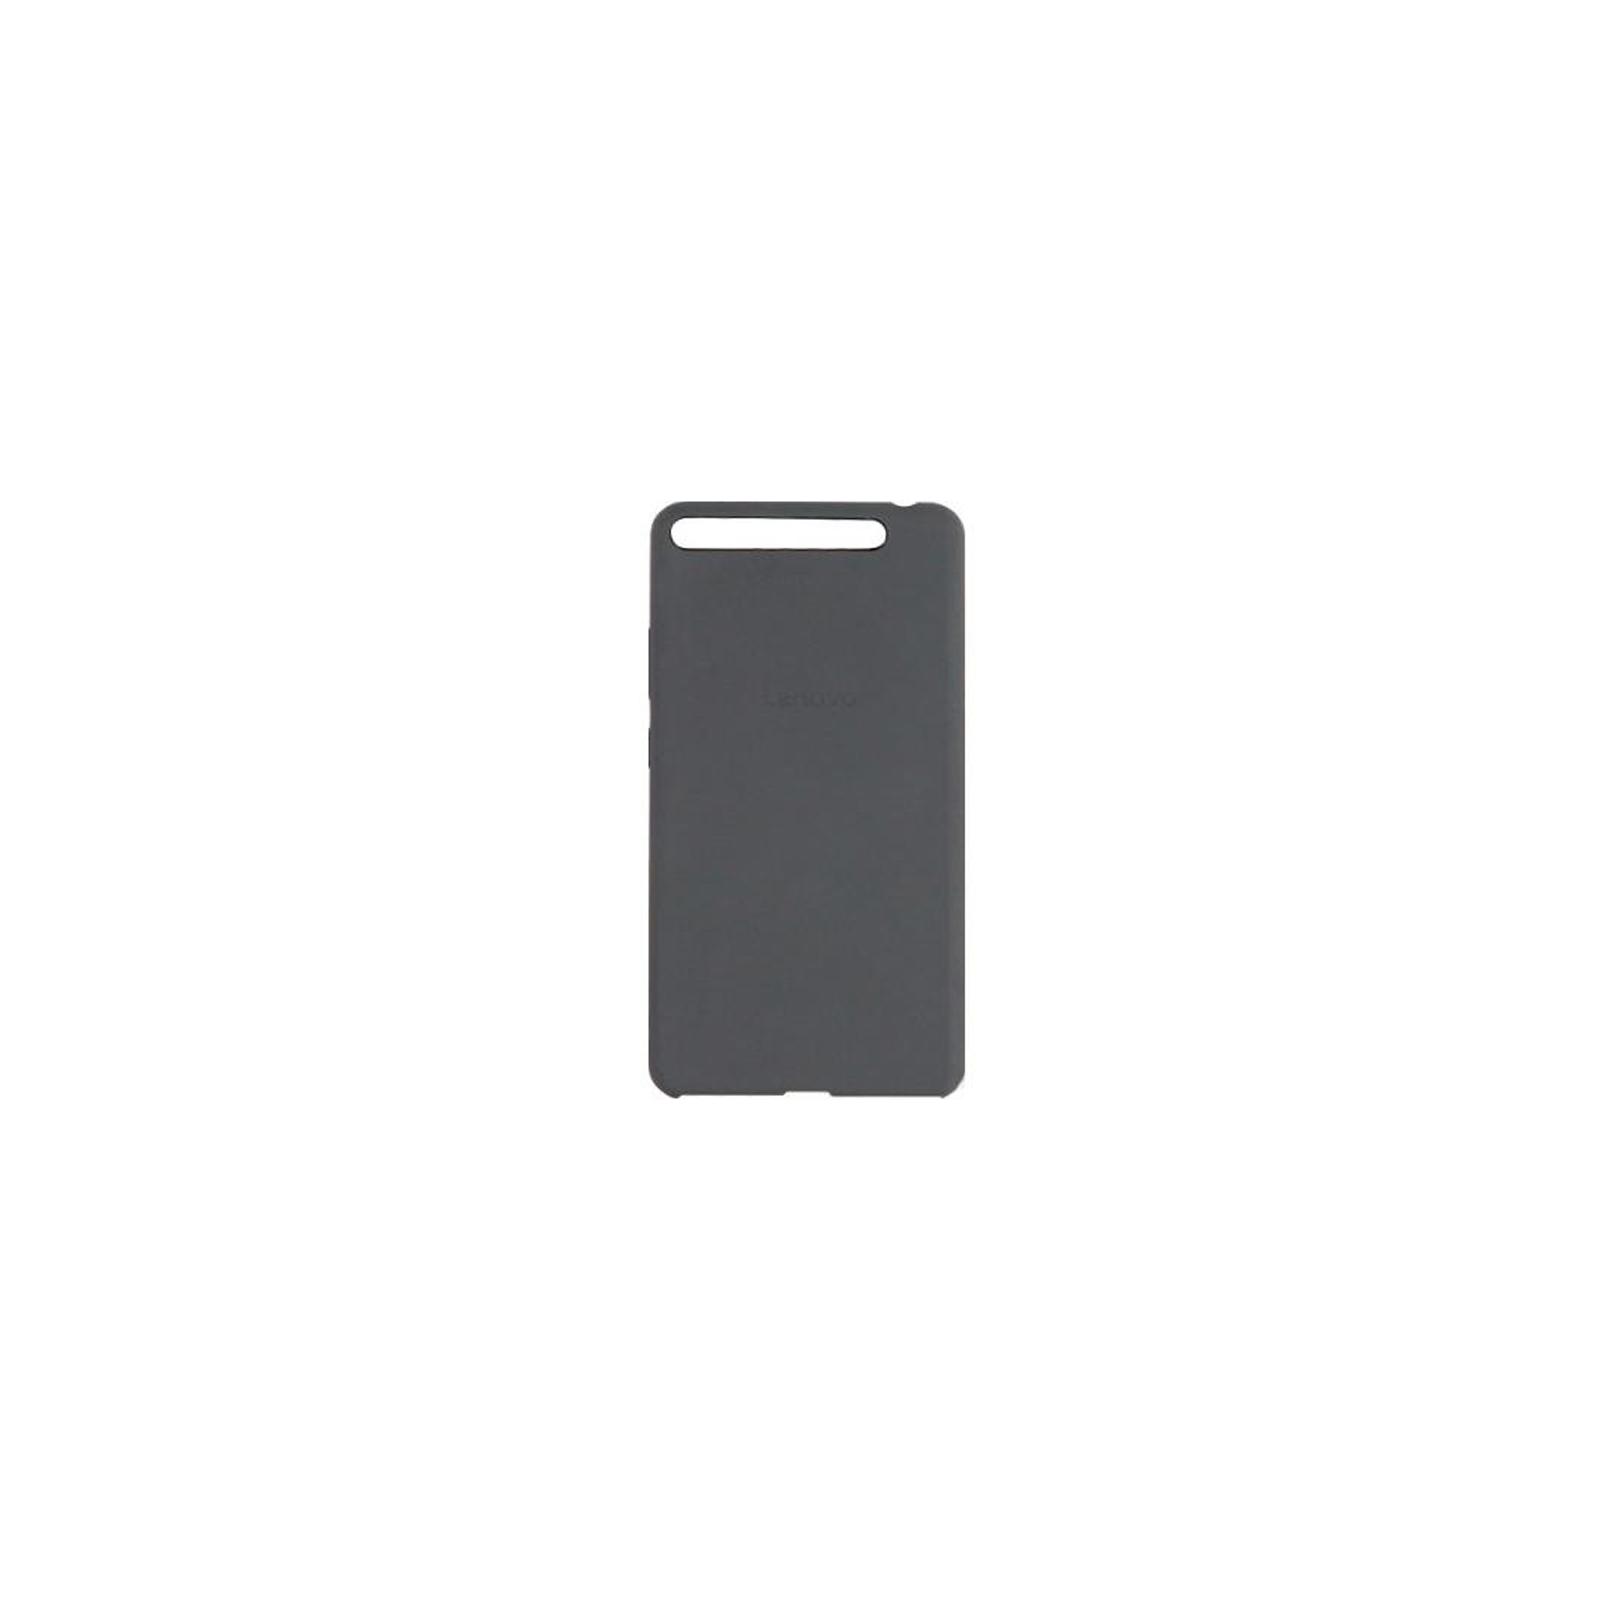 "Чехол для планшета Lenovo 7"" 750 PHAB back c&f Gray (ZG38C00829)"